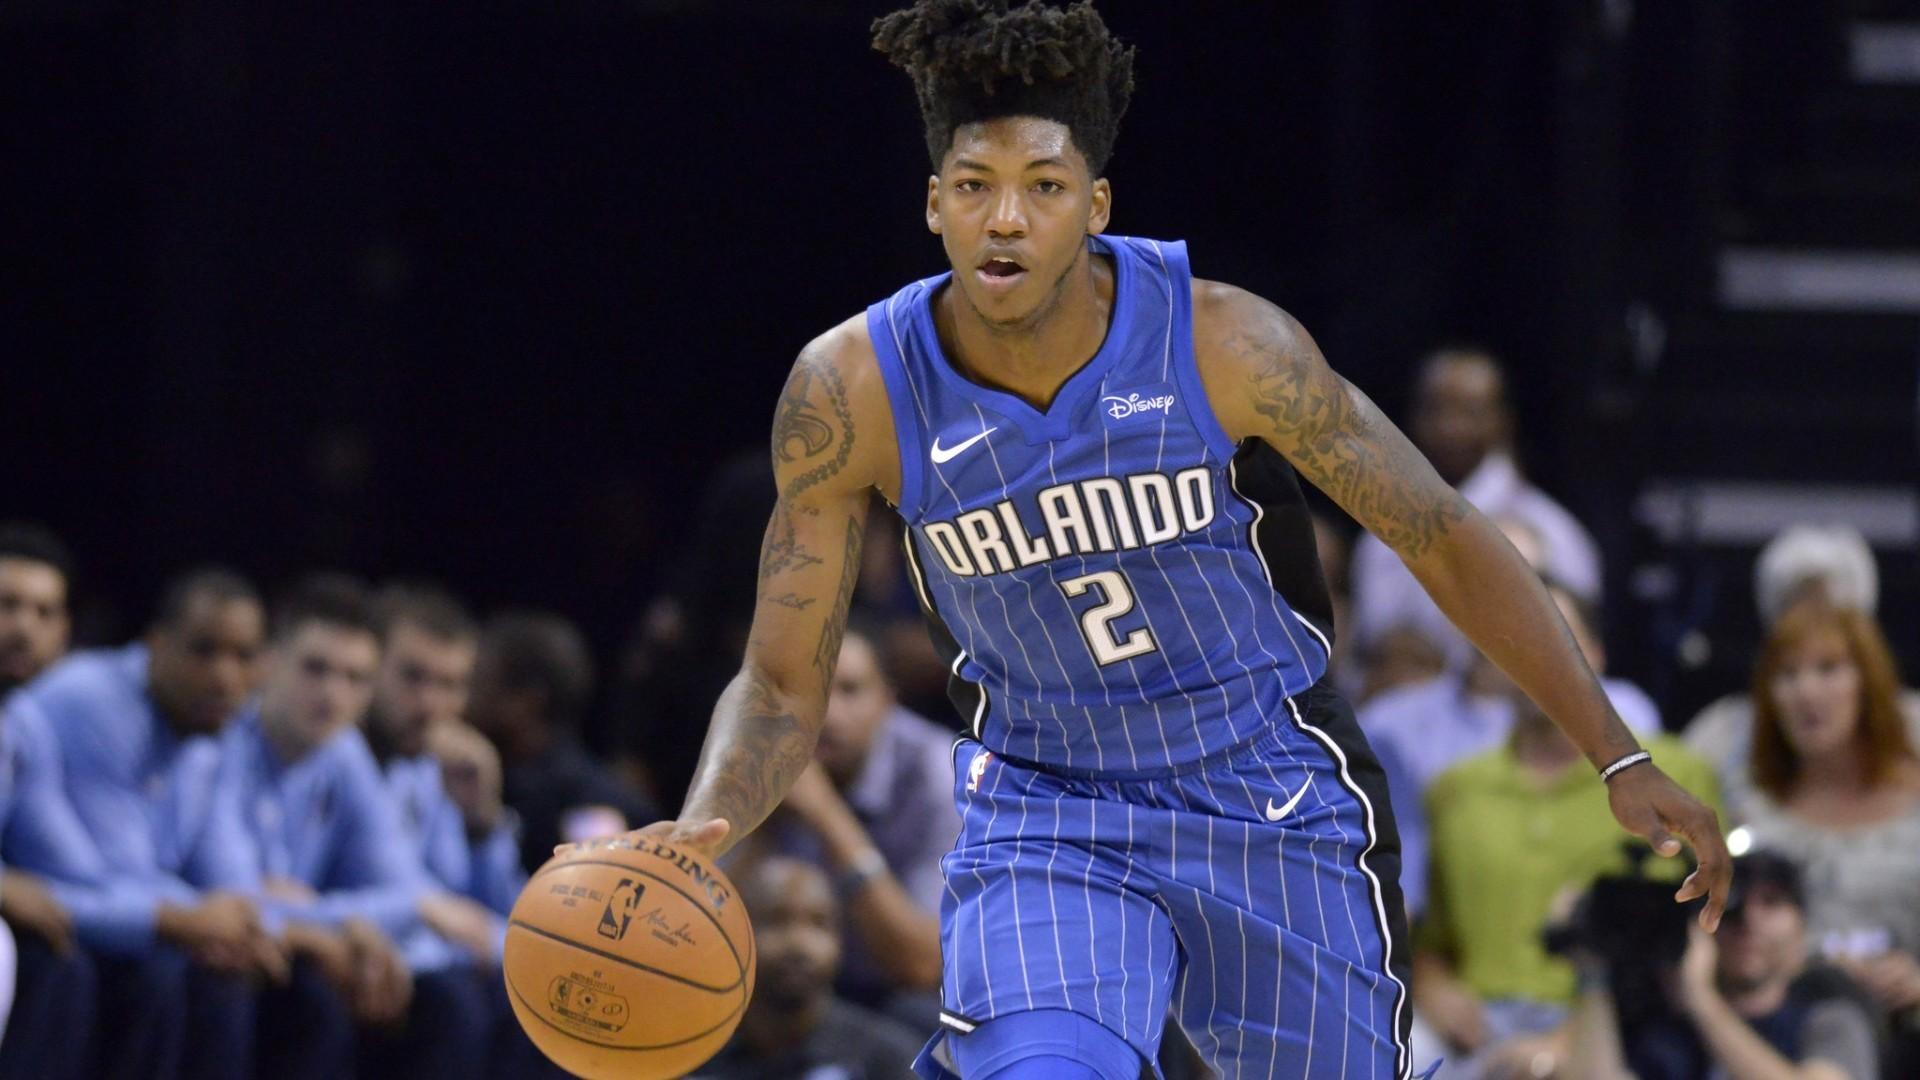 Orlando Magic Season Preview Video Looking ahead to the 2017-2018 Season -  Orlando Sentinel